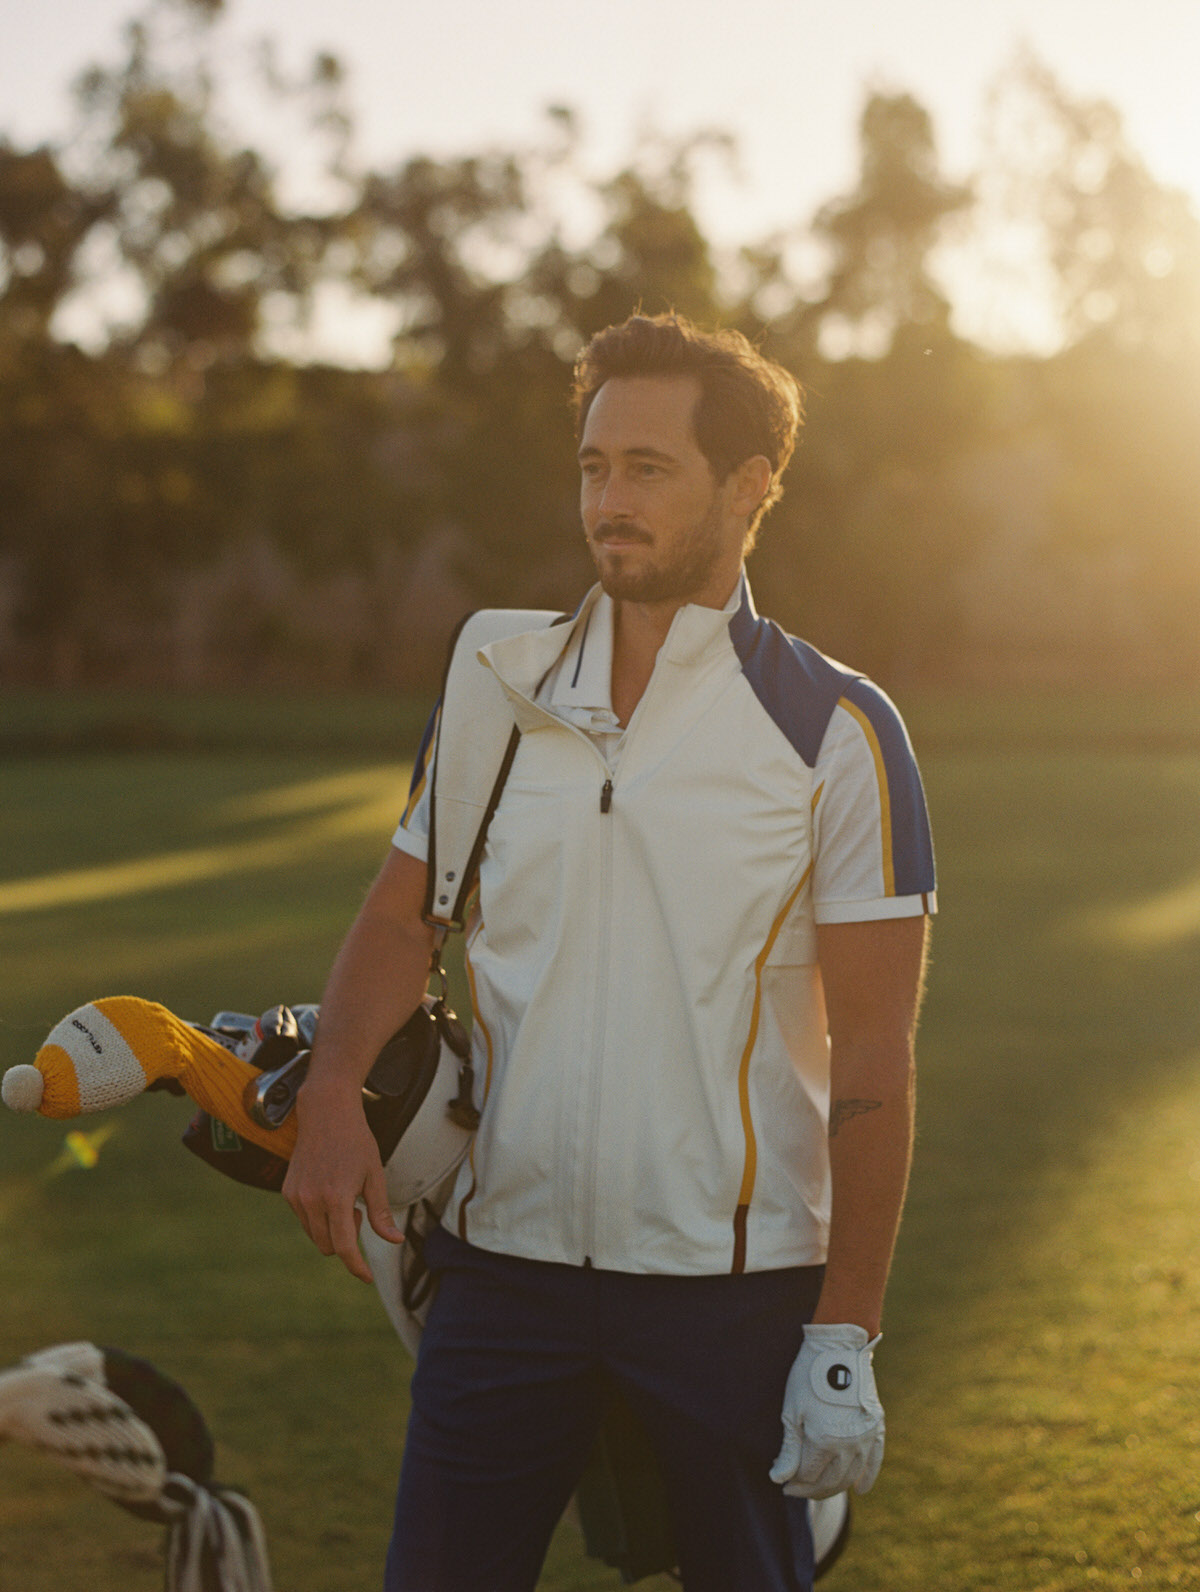 Justin Chung, ACL Golf, RIley Harper